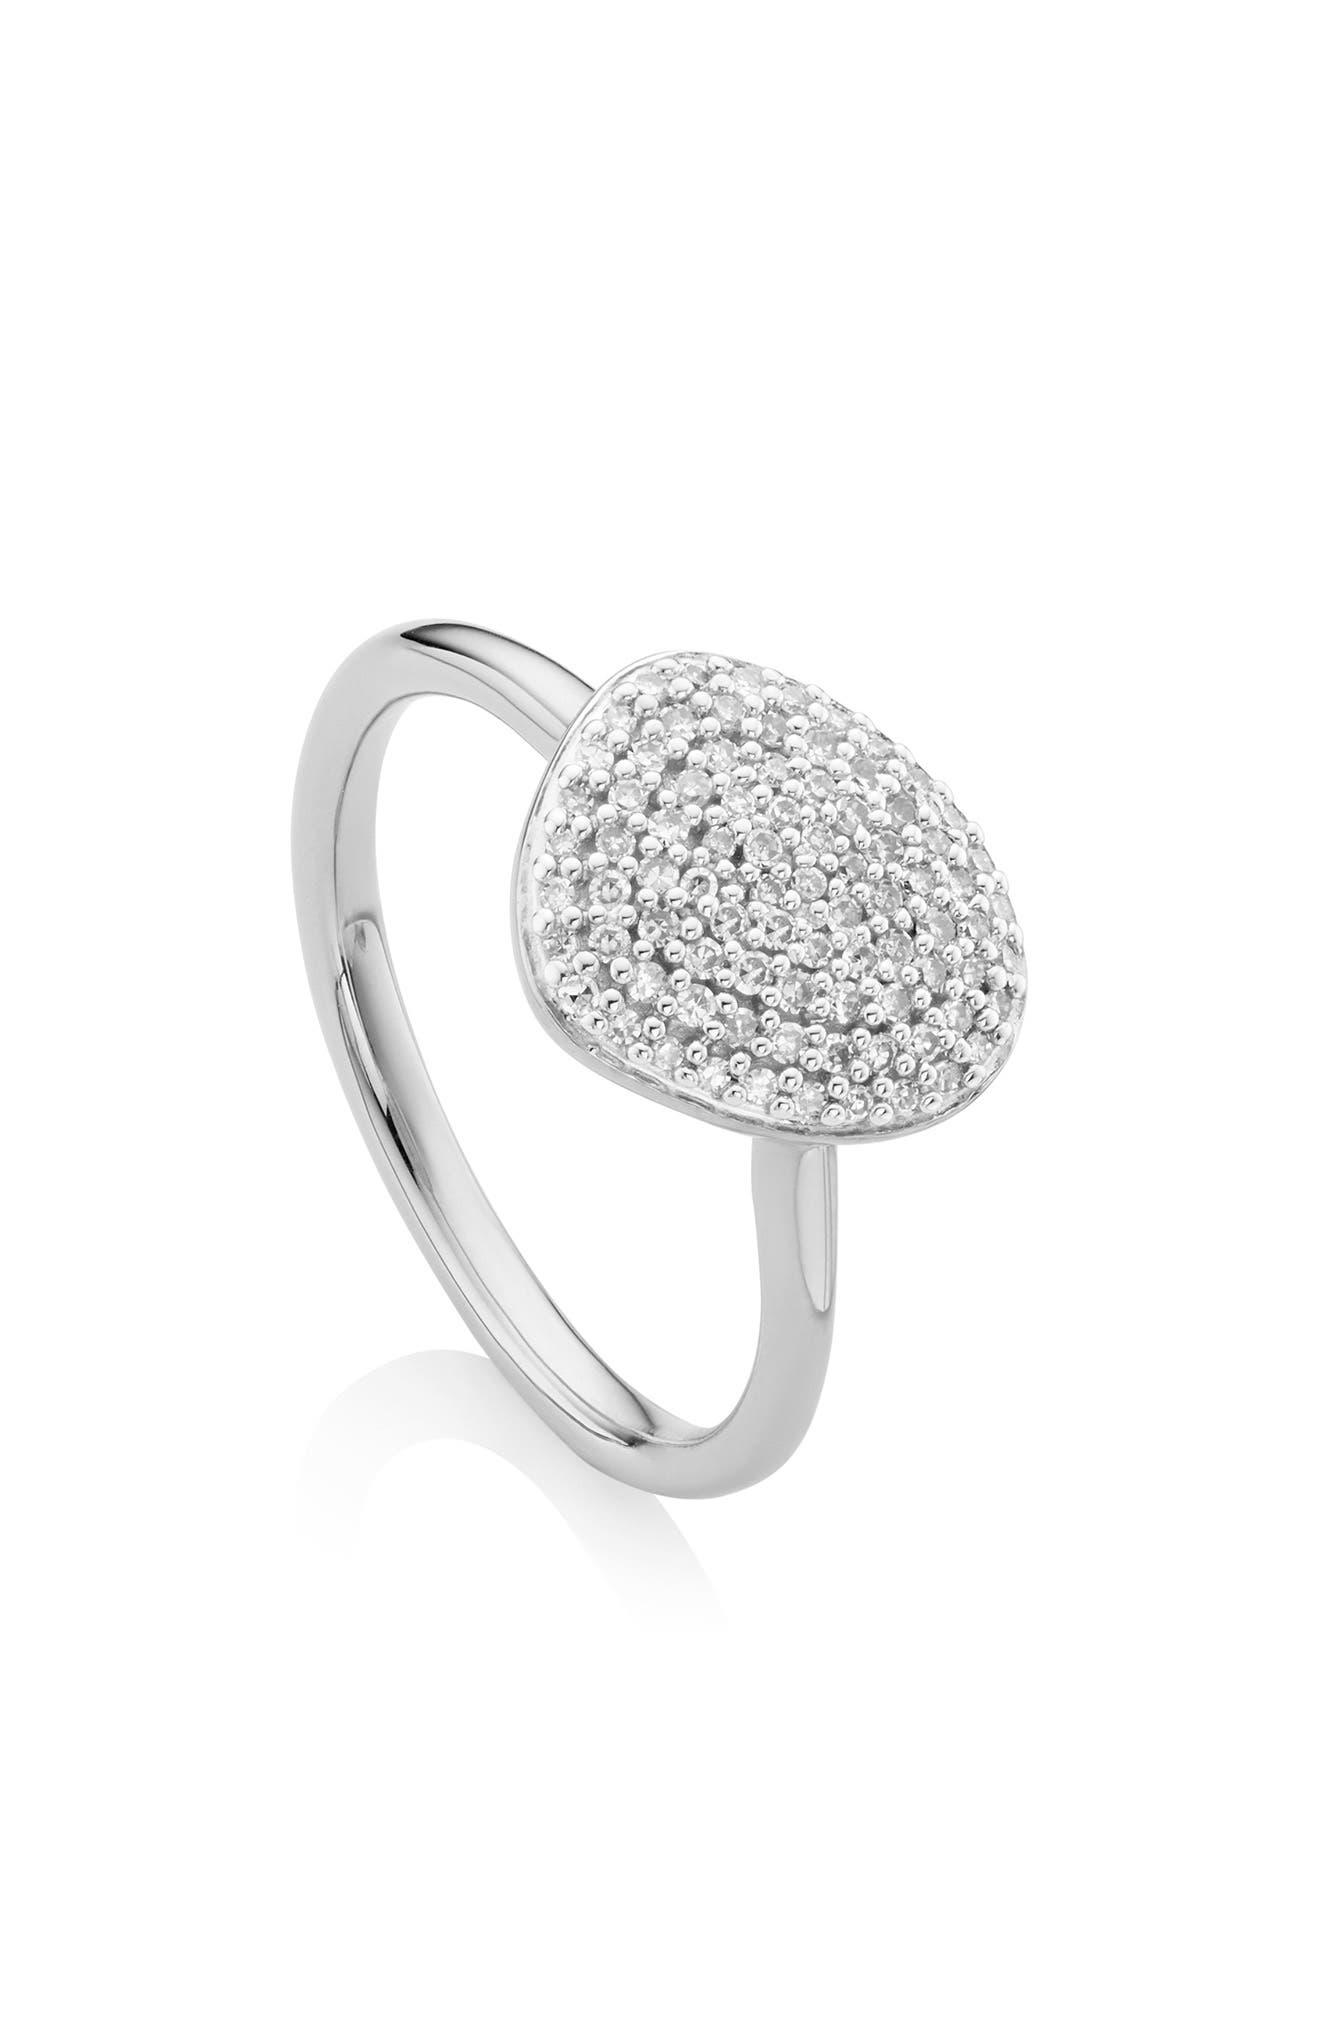 MONICA VINADER, Nura Diamond Pebble Stacking Ring, Main thumbnail 1, color, SILVER/ DIAMOND